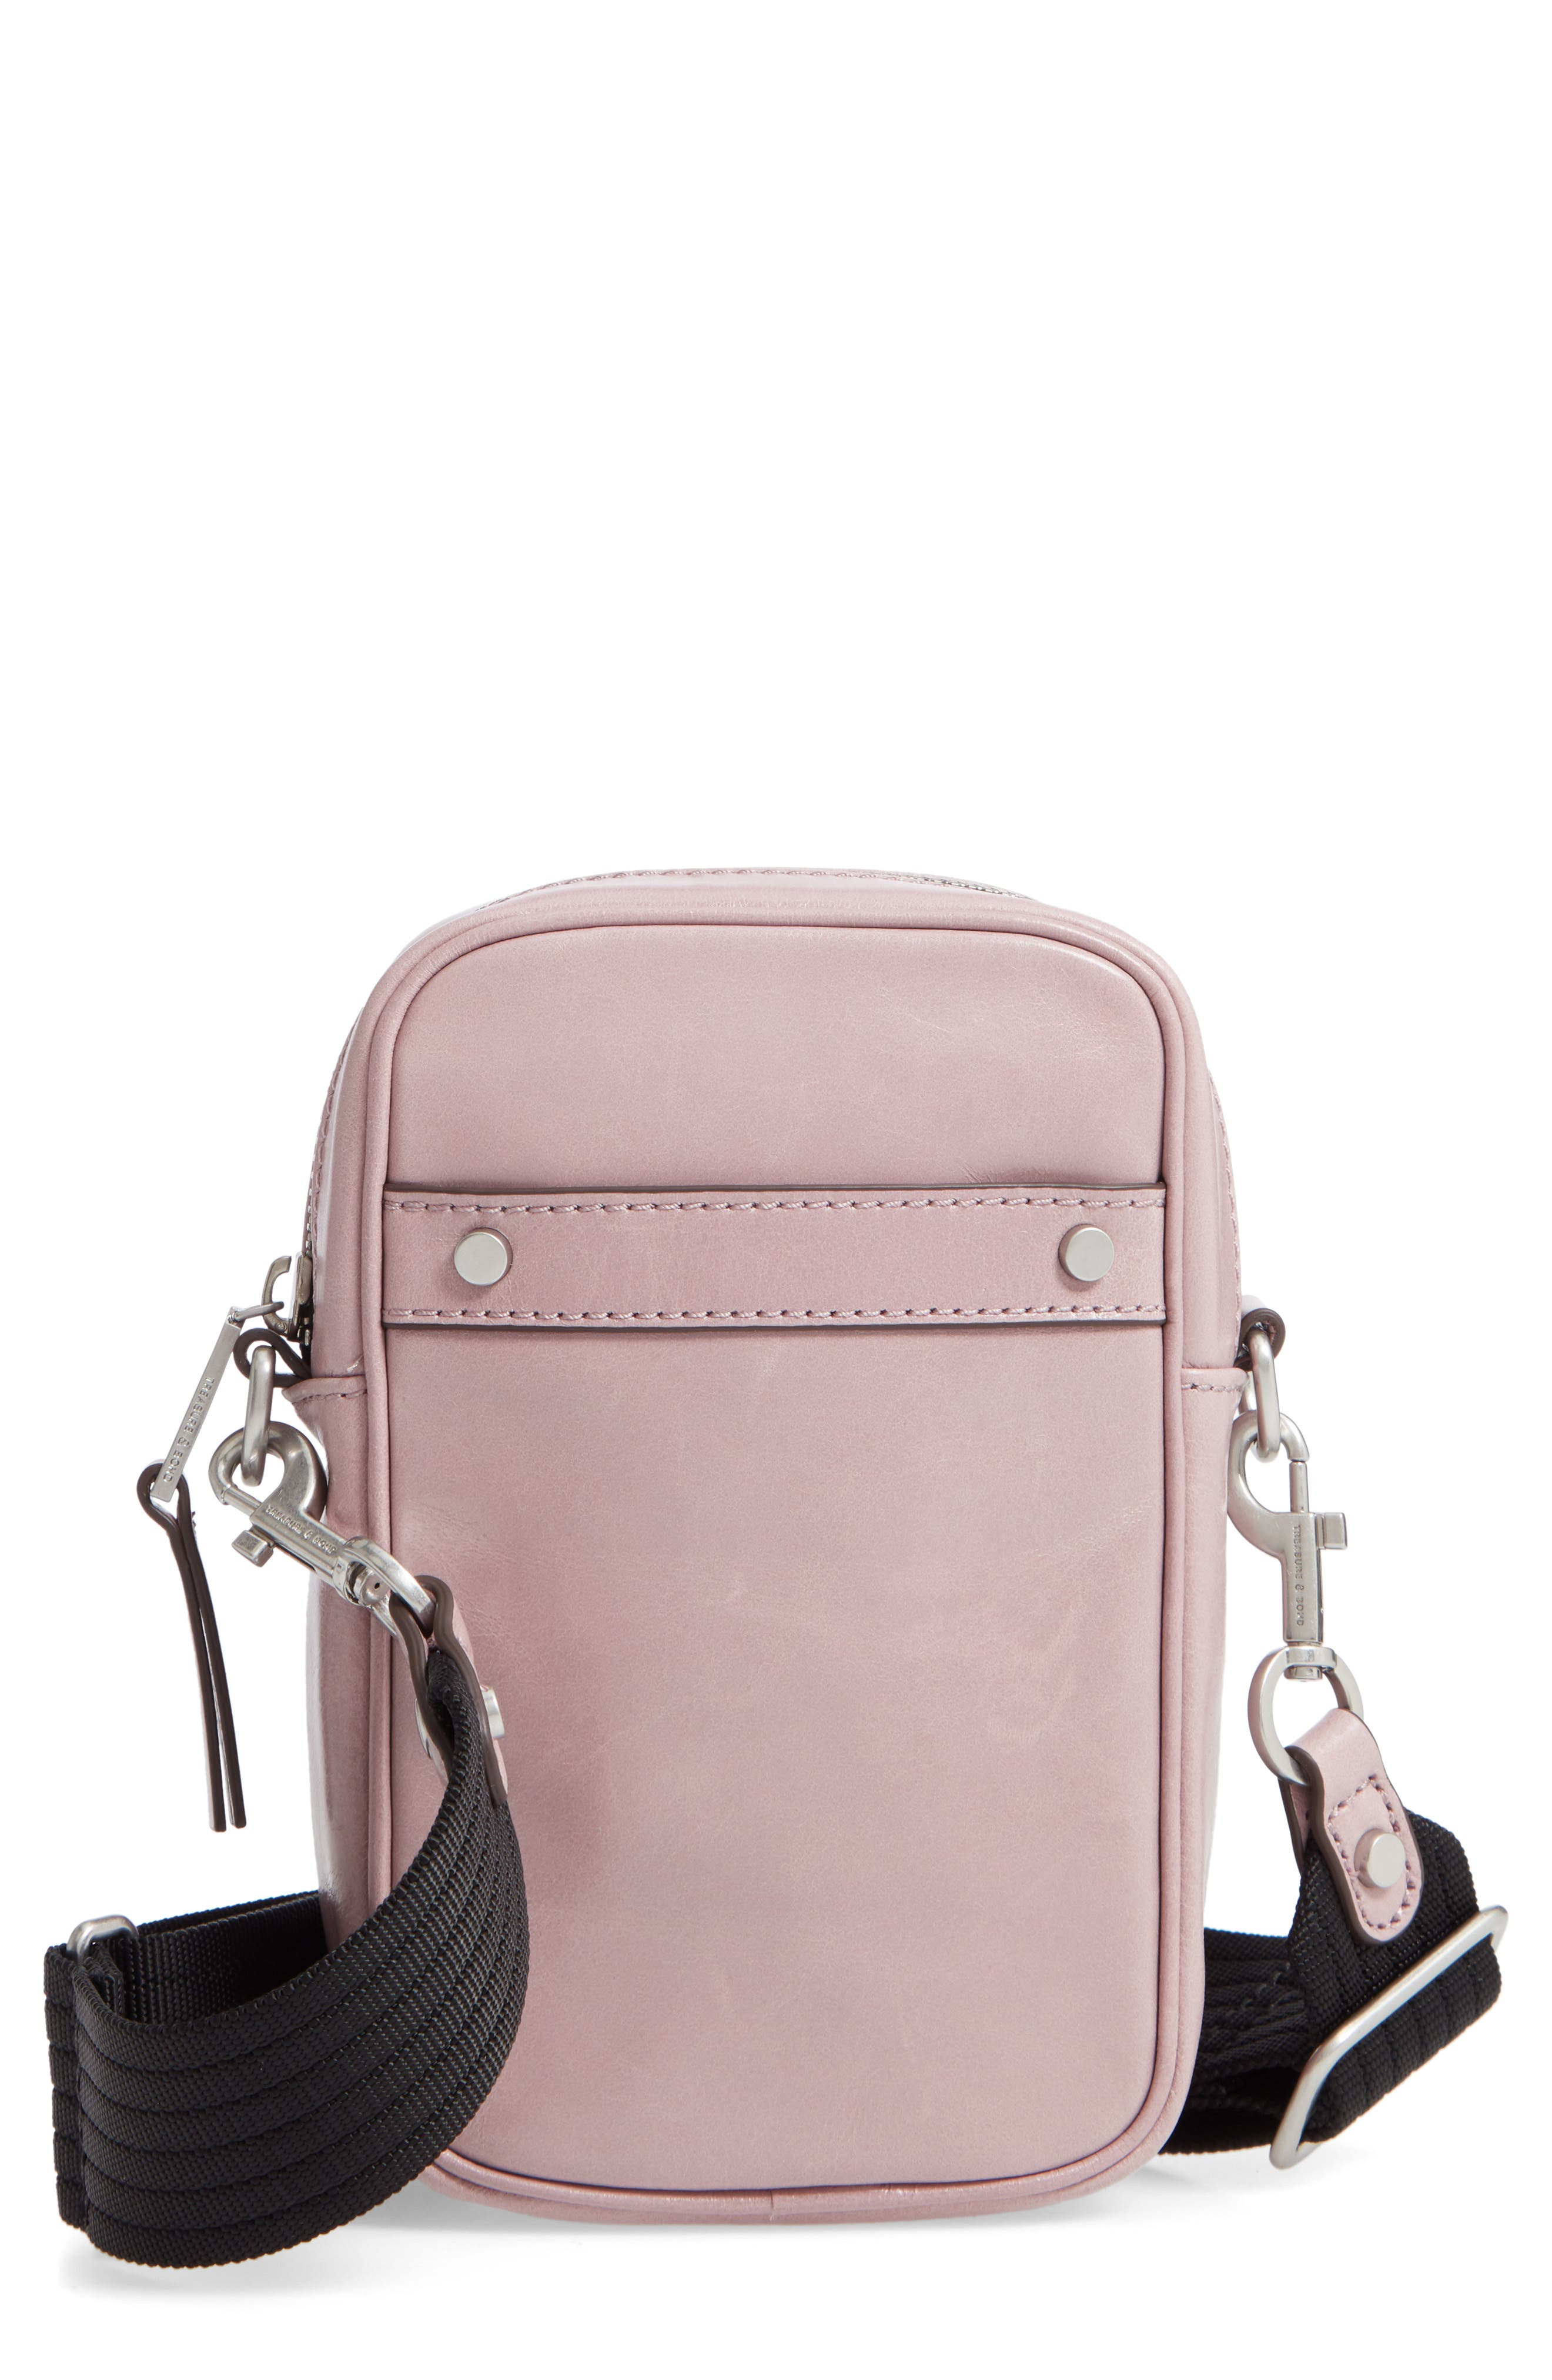 26ca8fafc0d4 Treasure   Bond Handbags   Wallets for Women